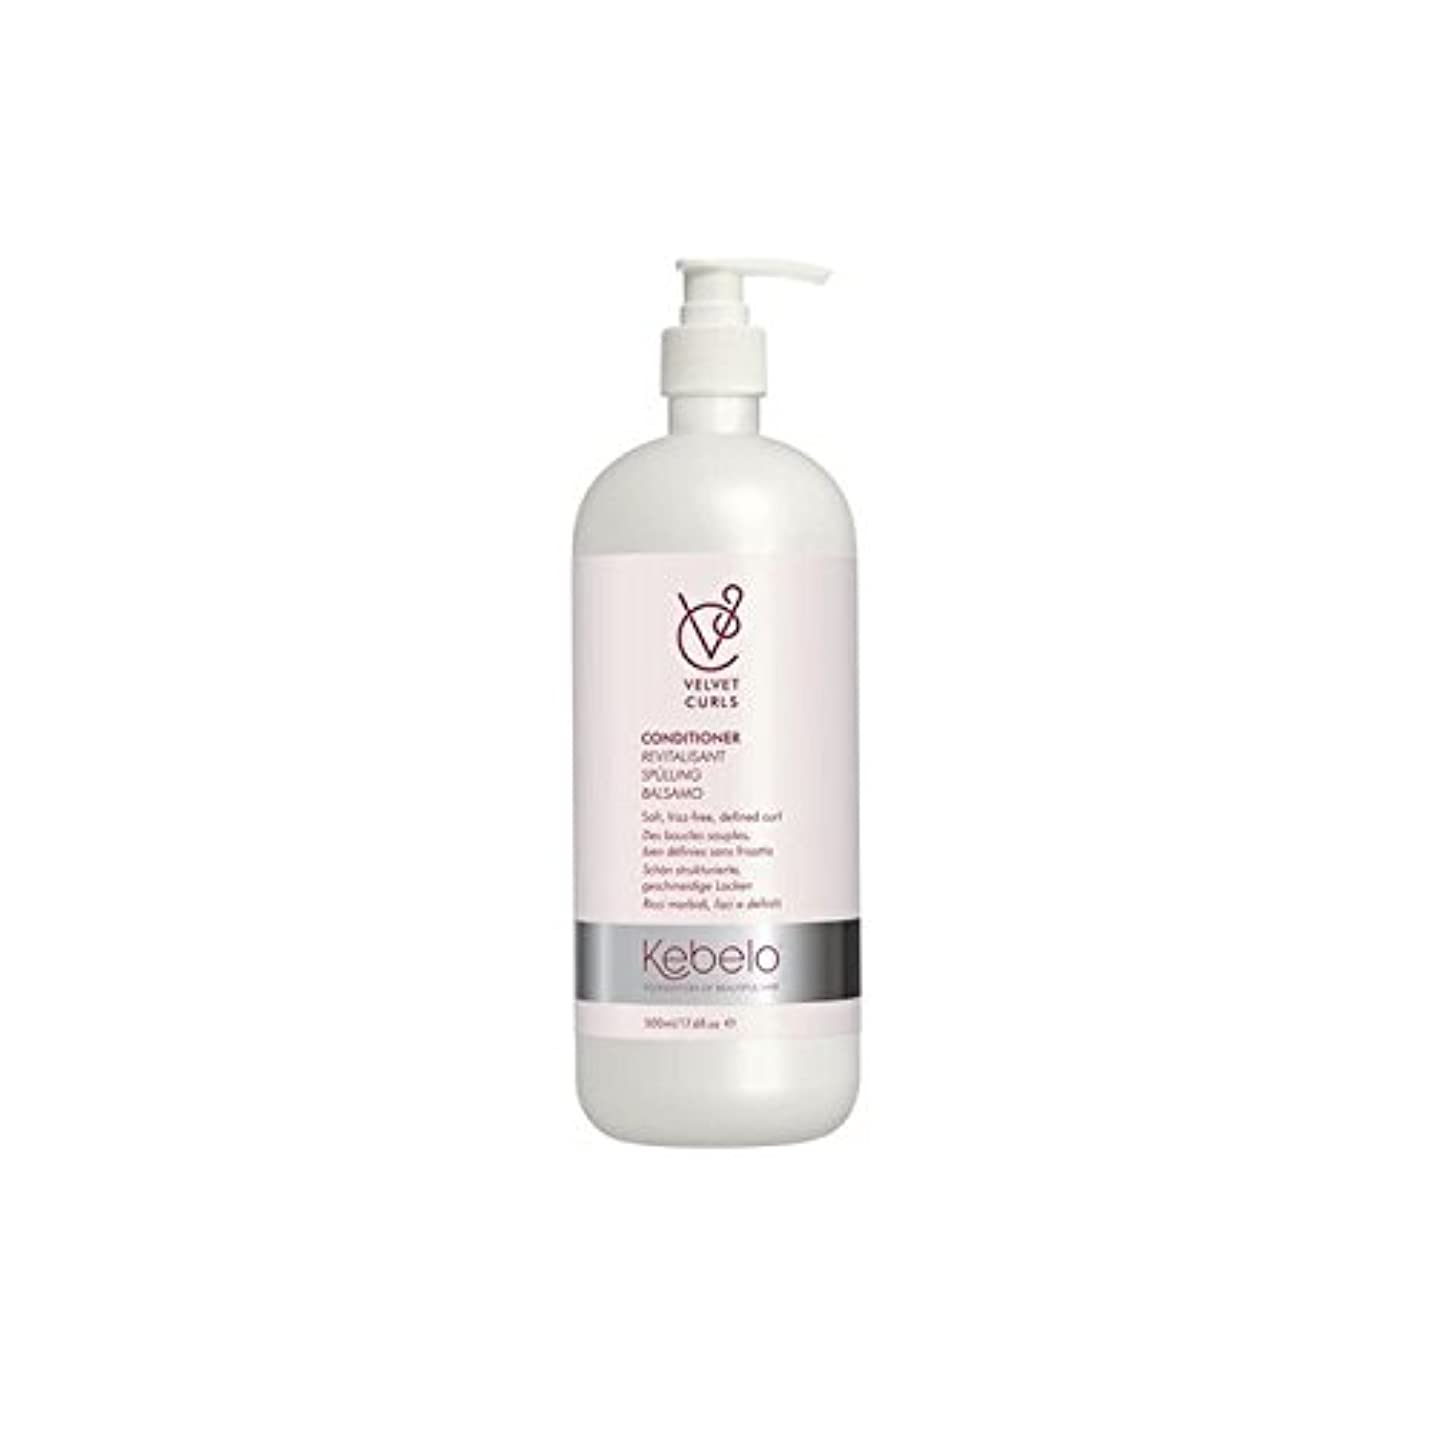 Kebelo Velvet Curls Conditioner (500ml) - ベルベットのカールコンディショナー(500ミリリットル) [並行輸入品]